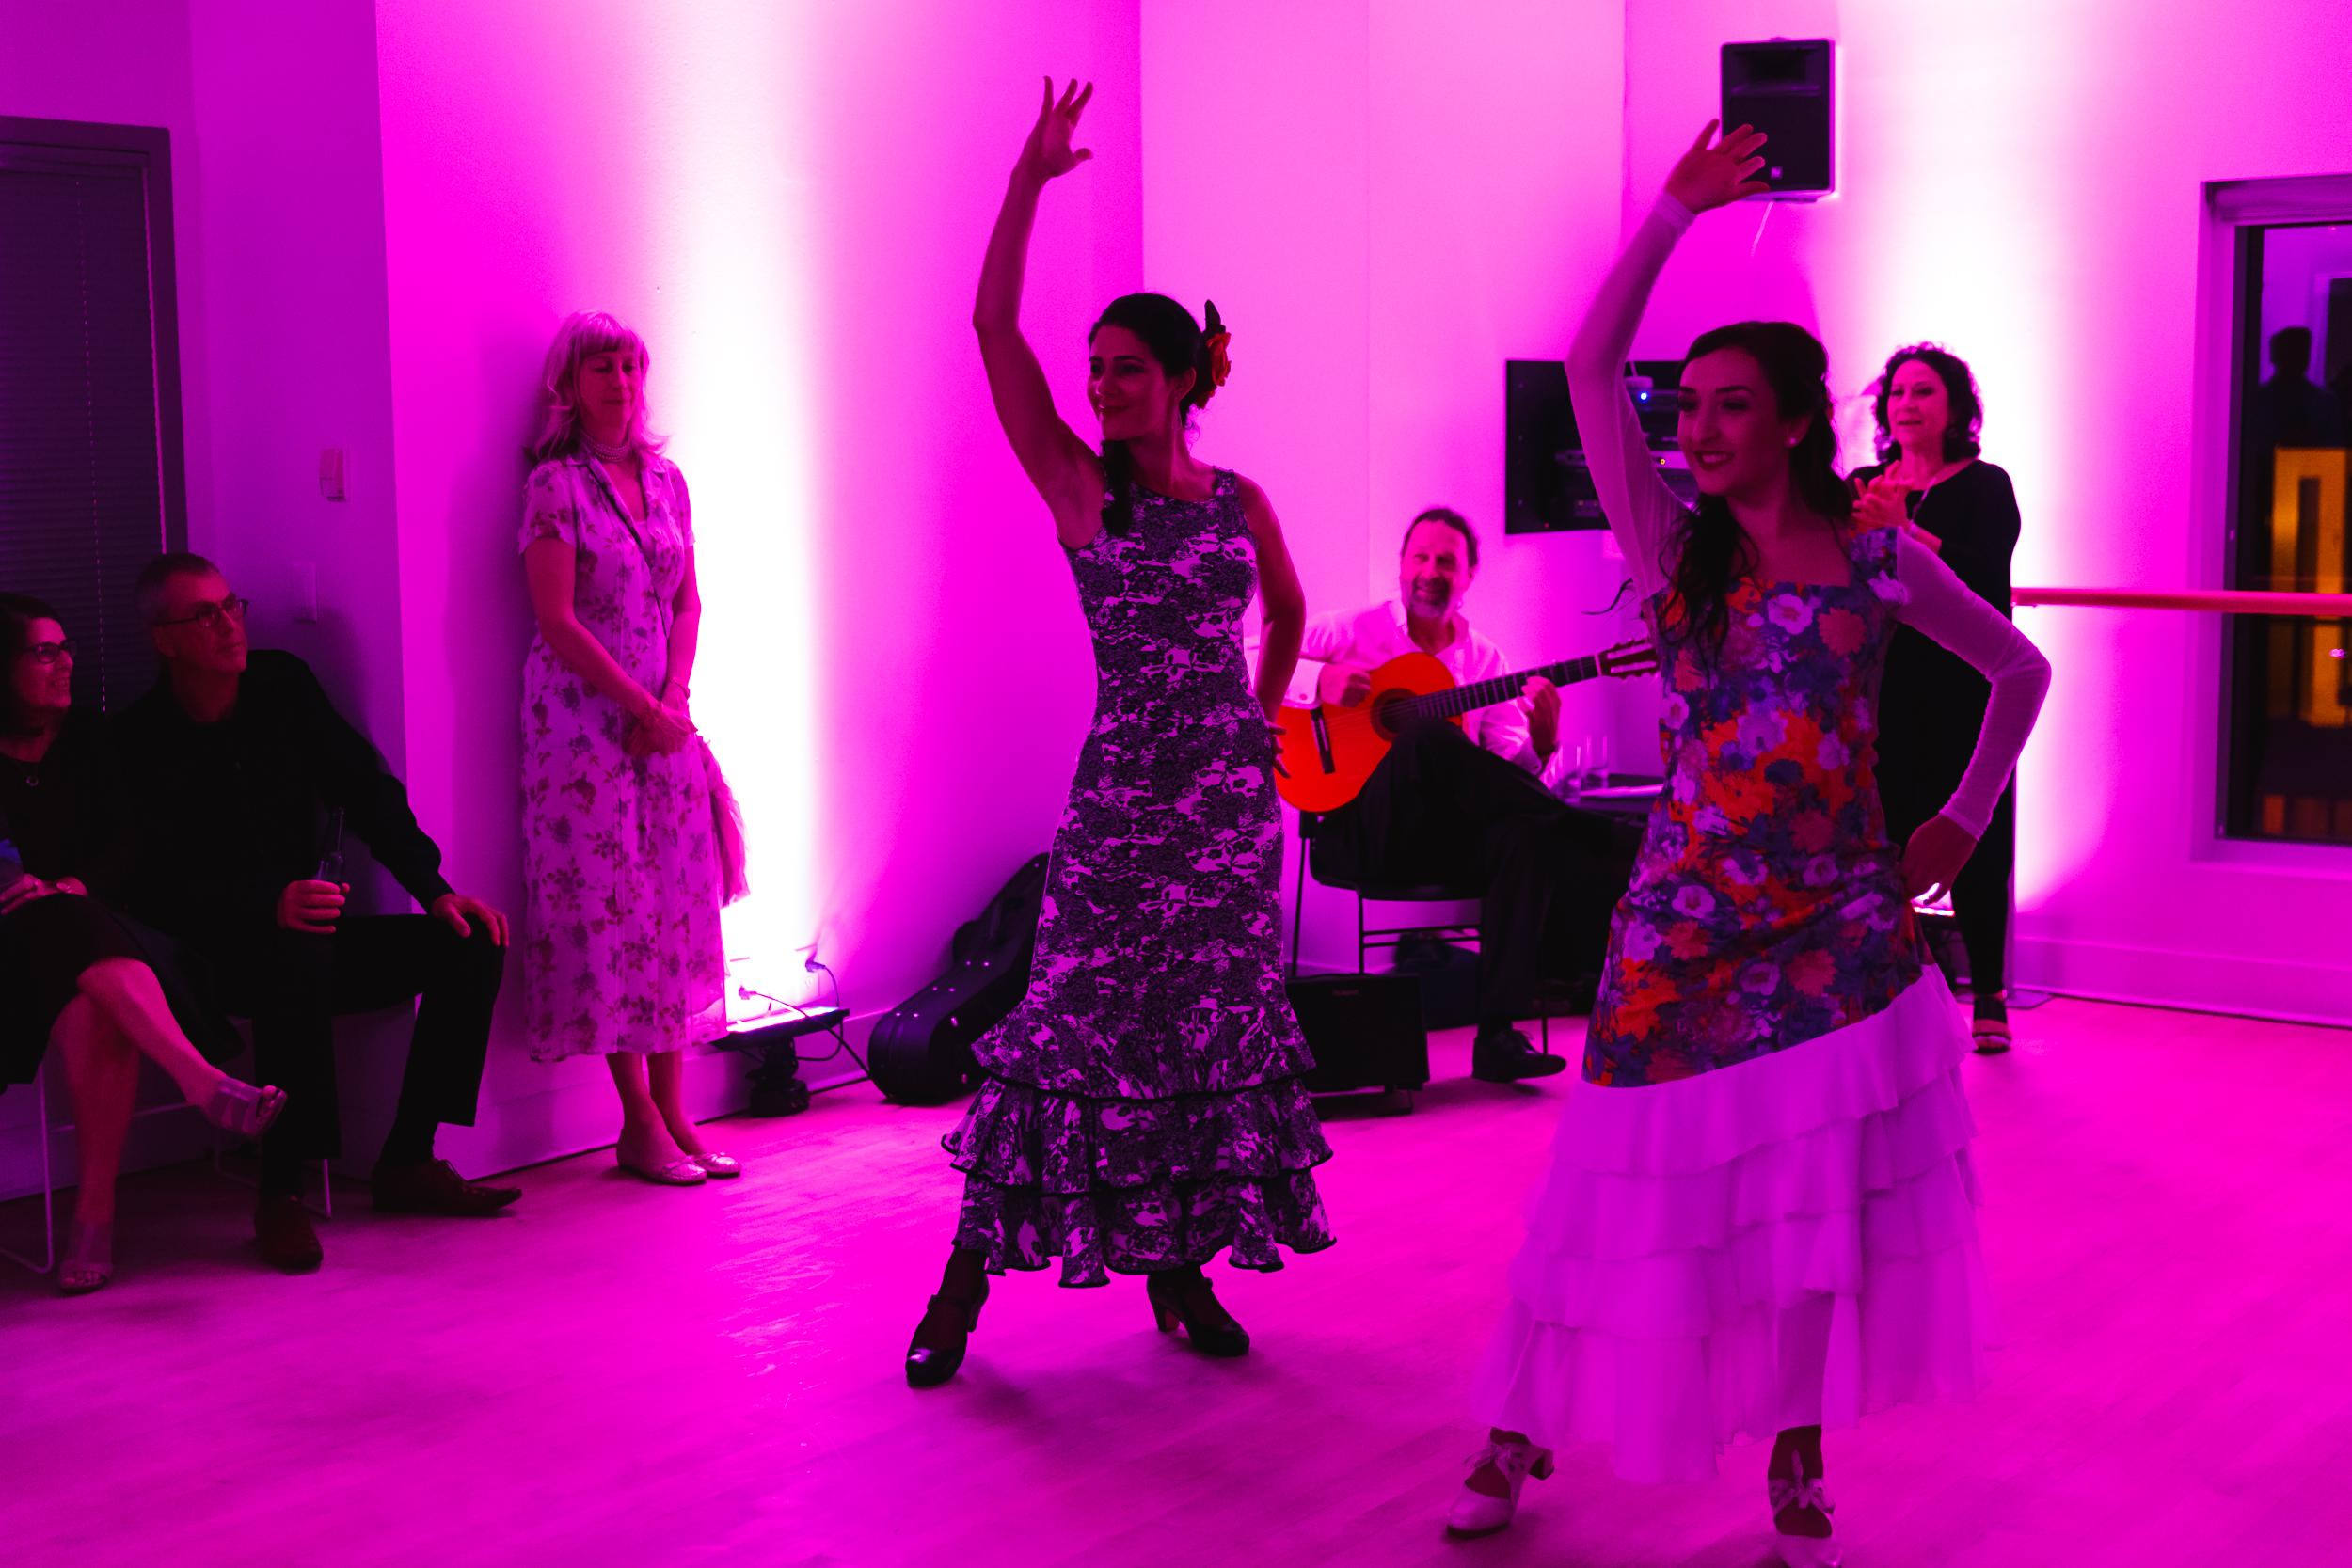 Scotiabank-Dance-Hotel-image23.jpg